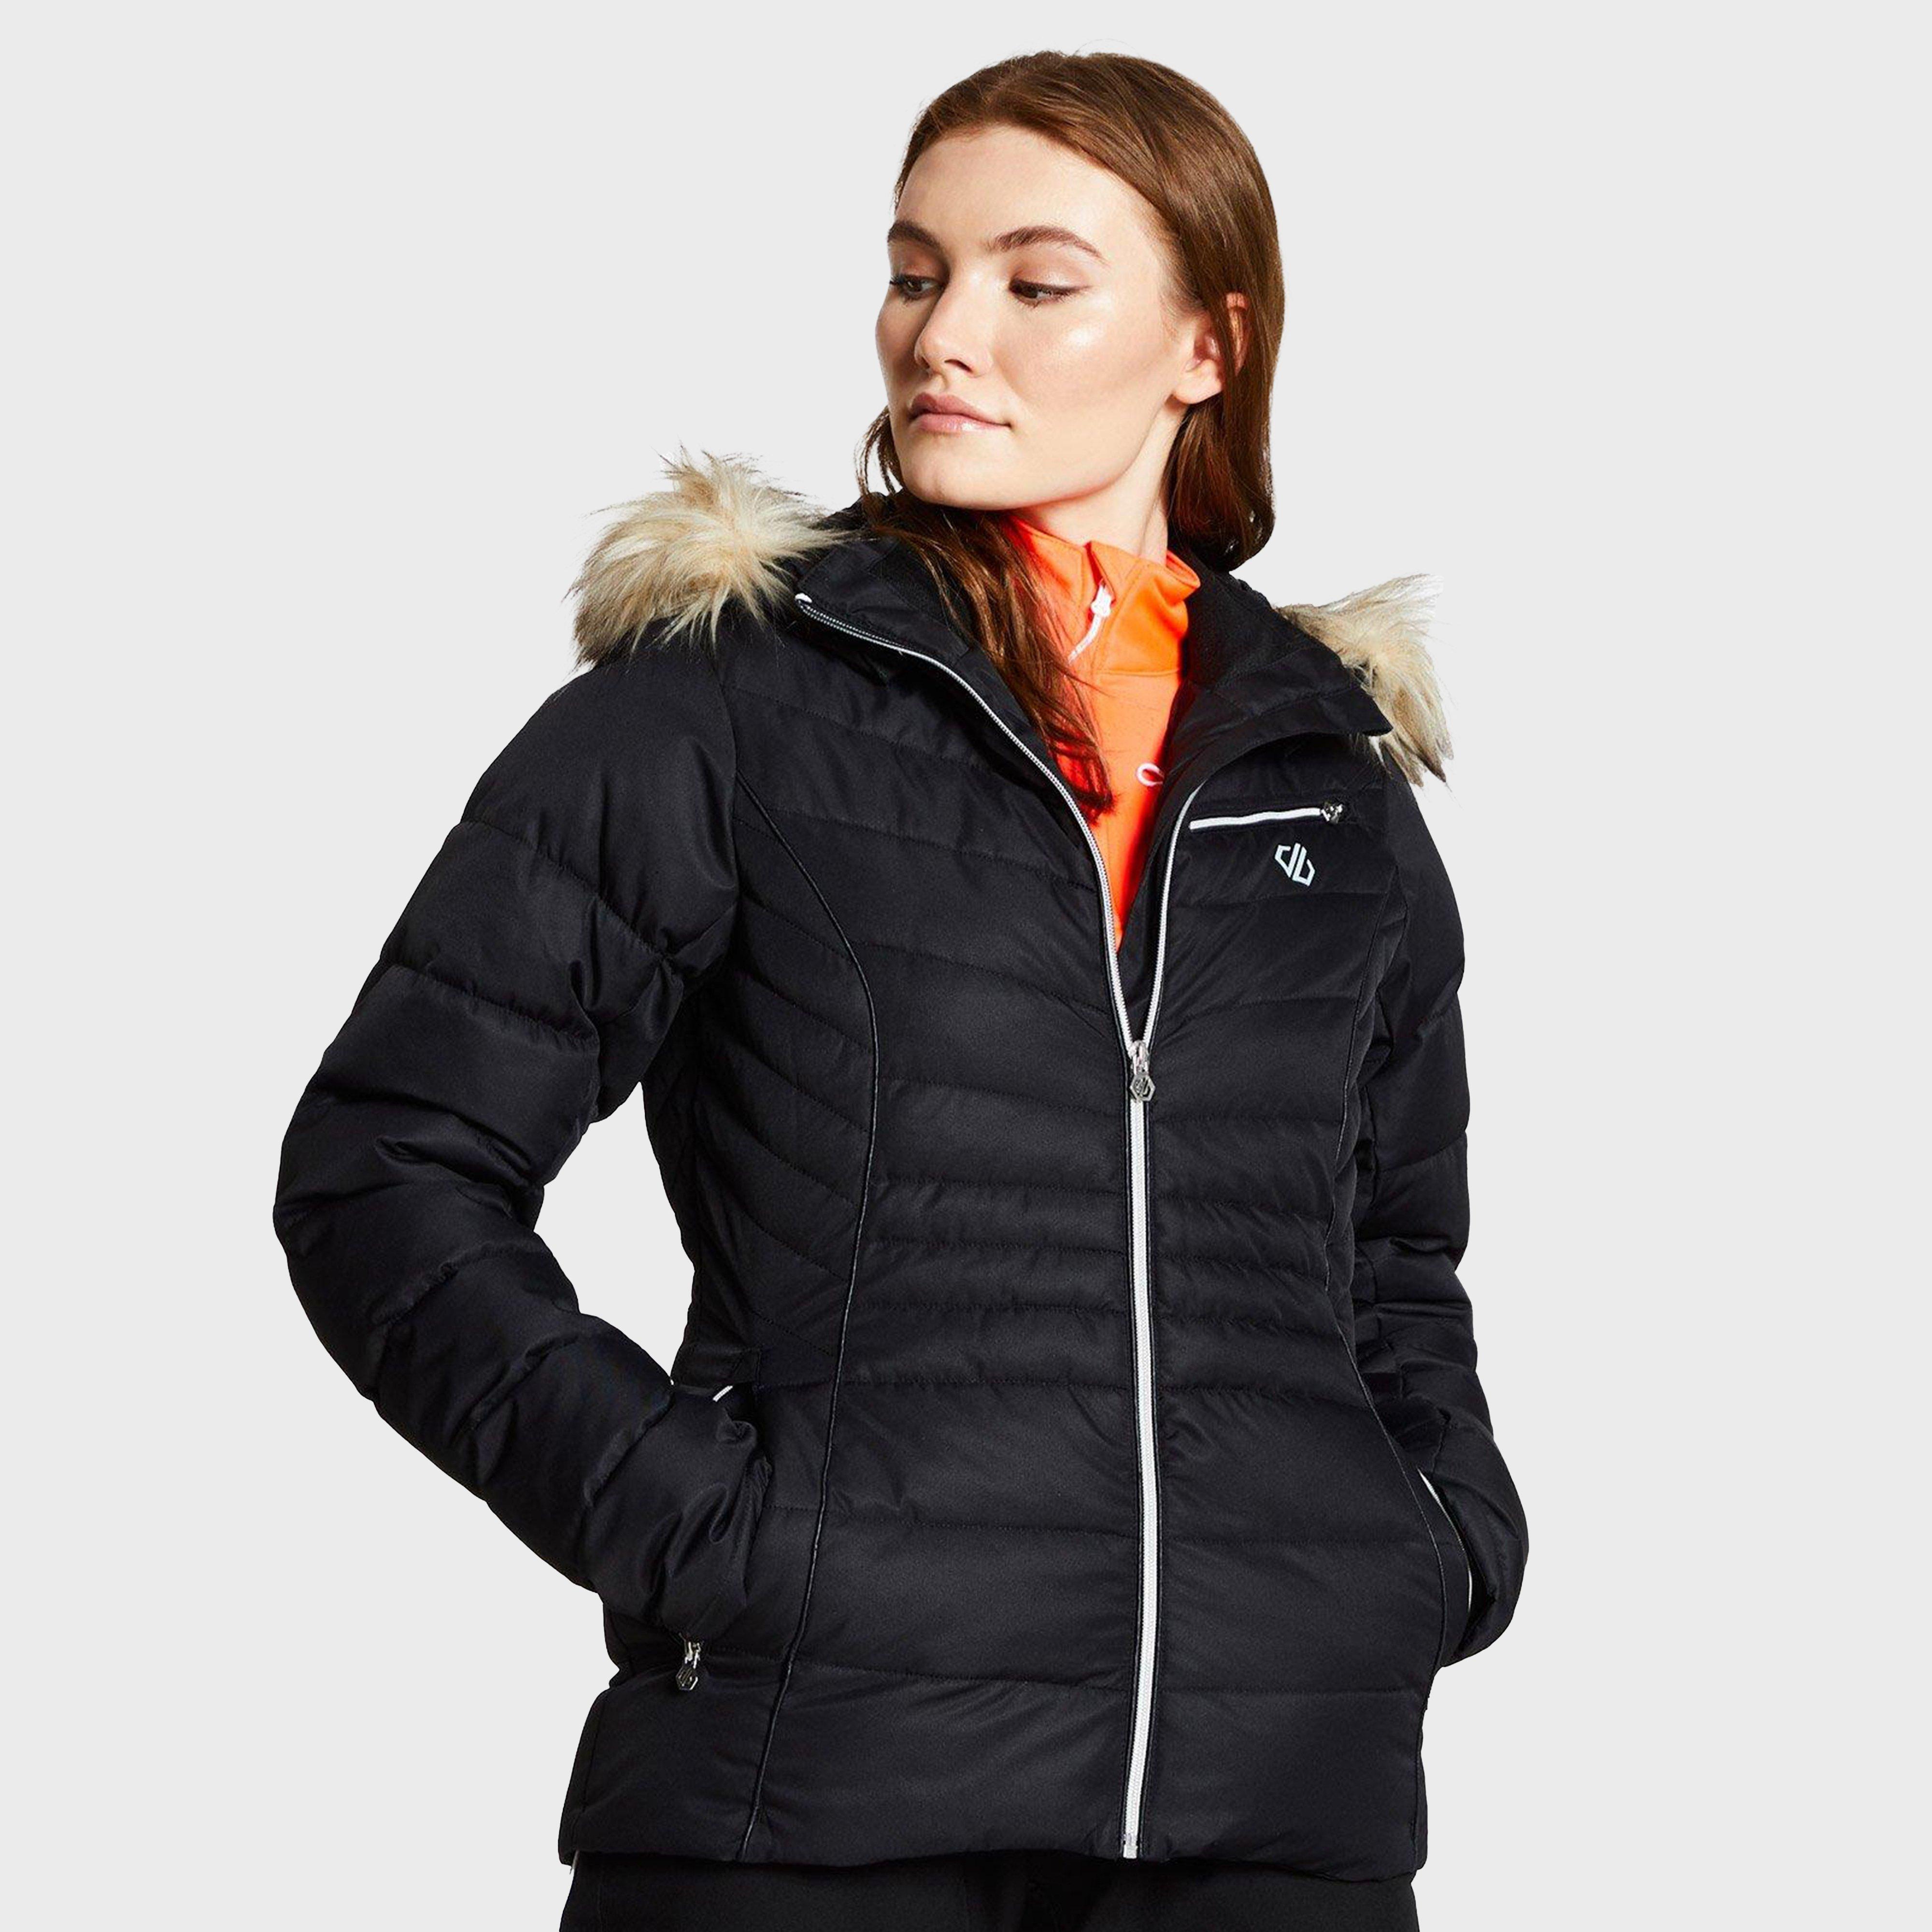 Dare 2b Dare 2B Womens Glamorize Ski Jacket